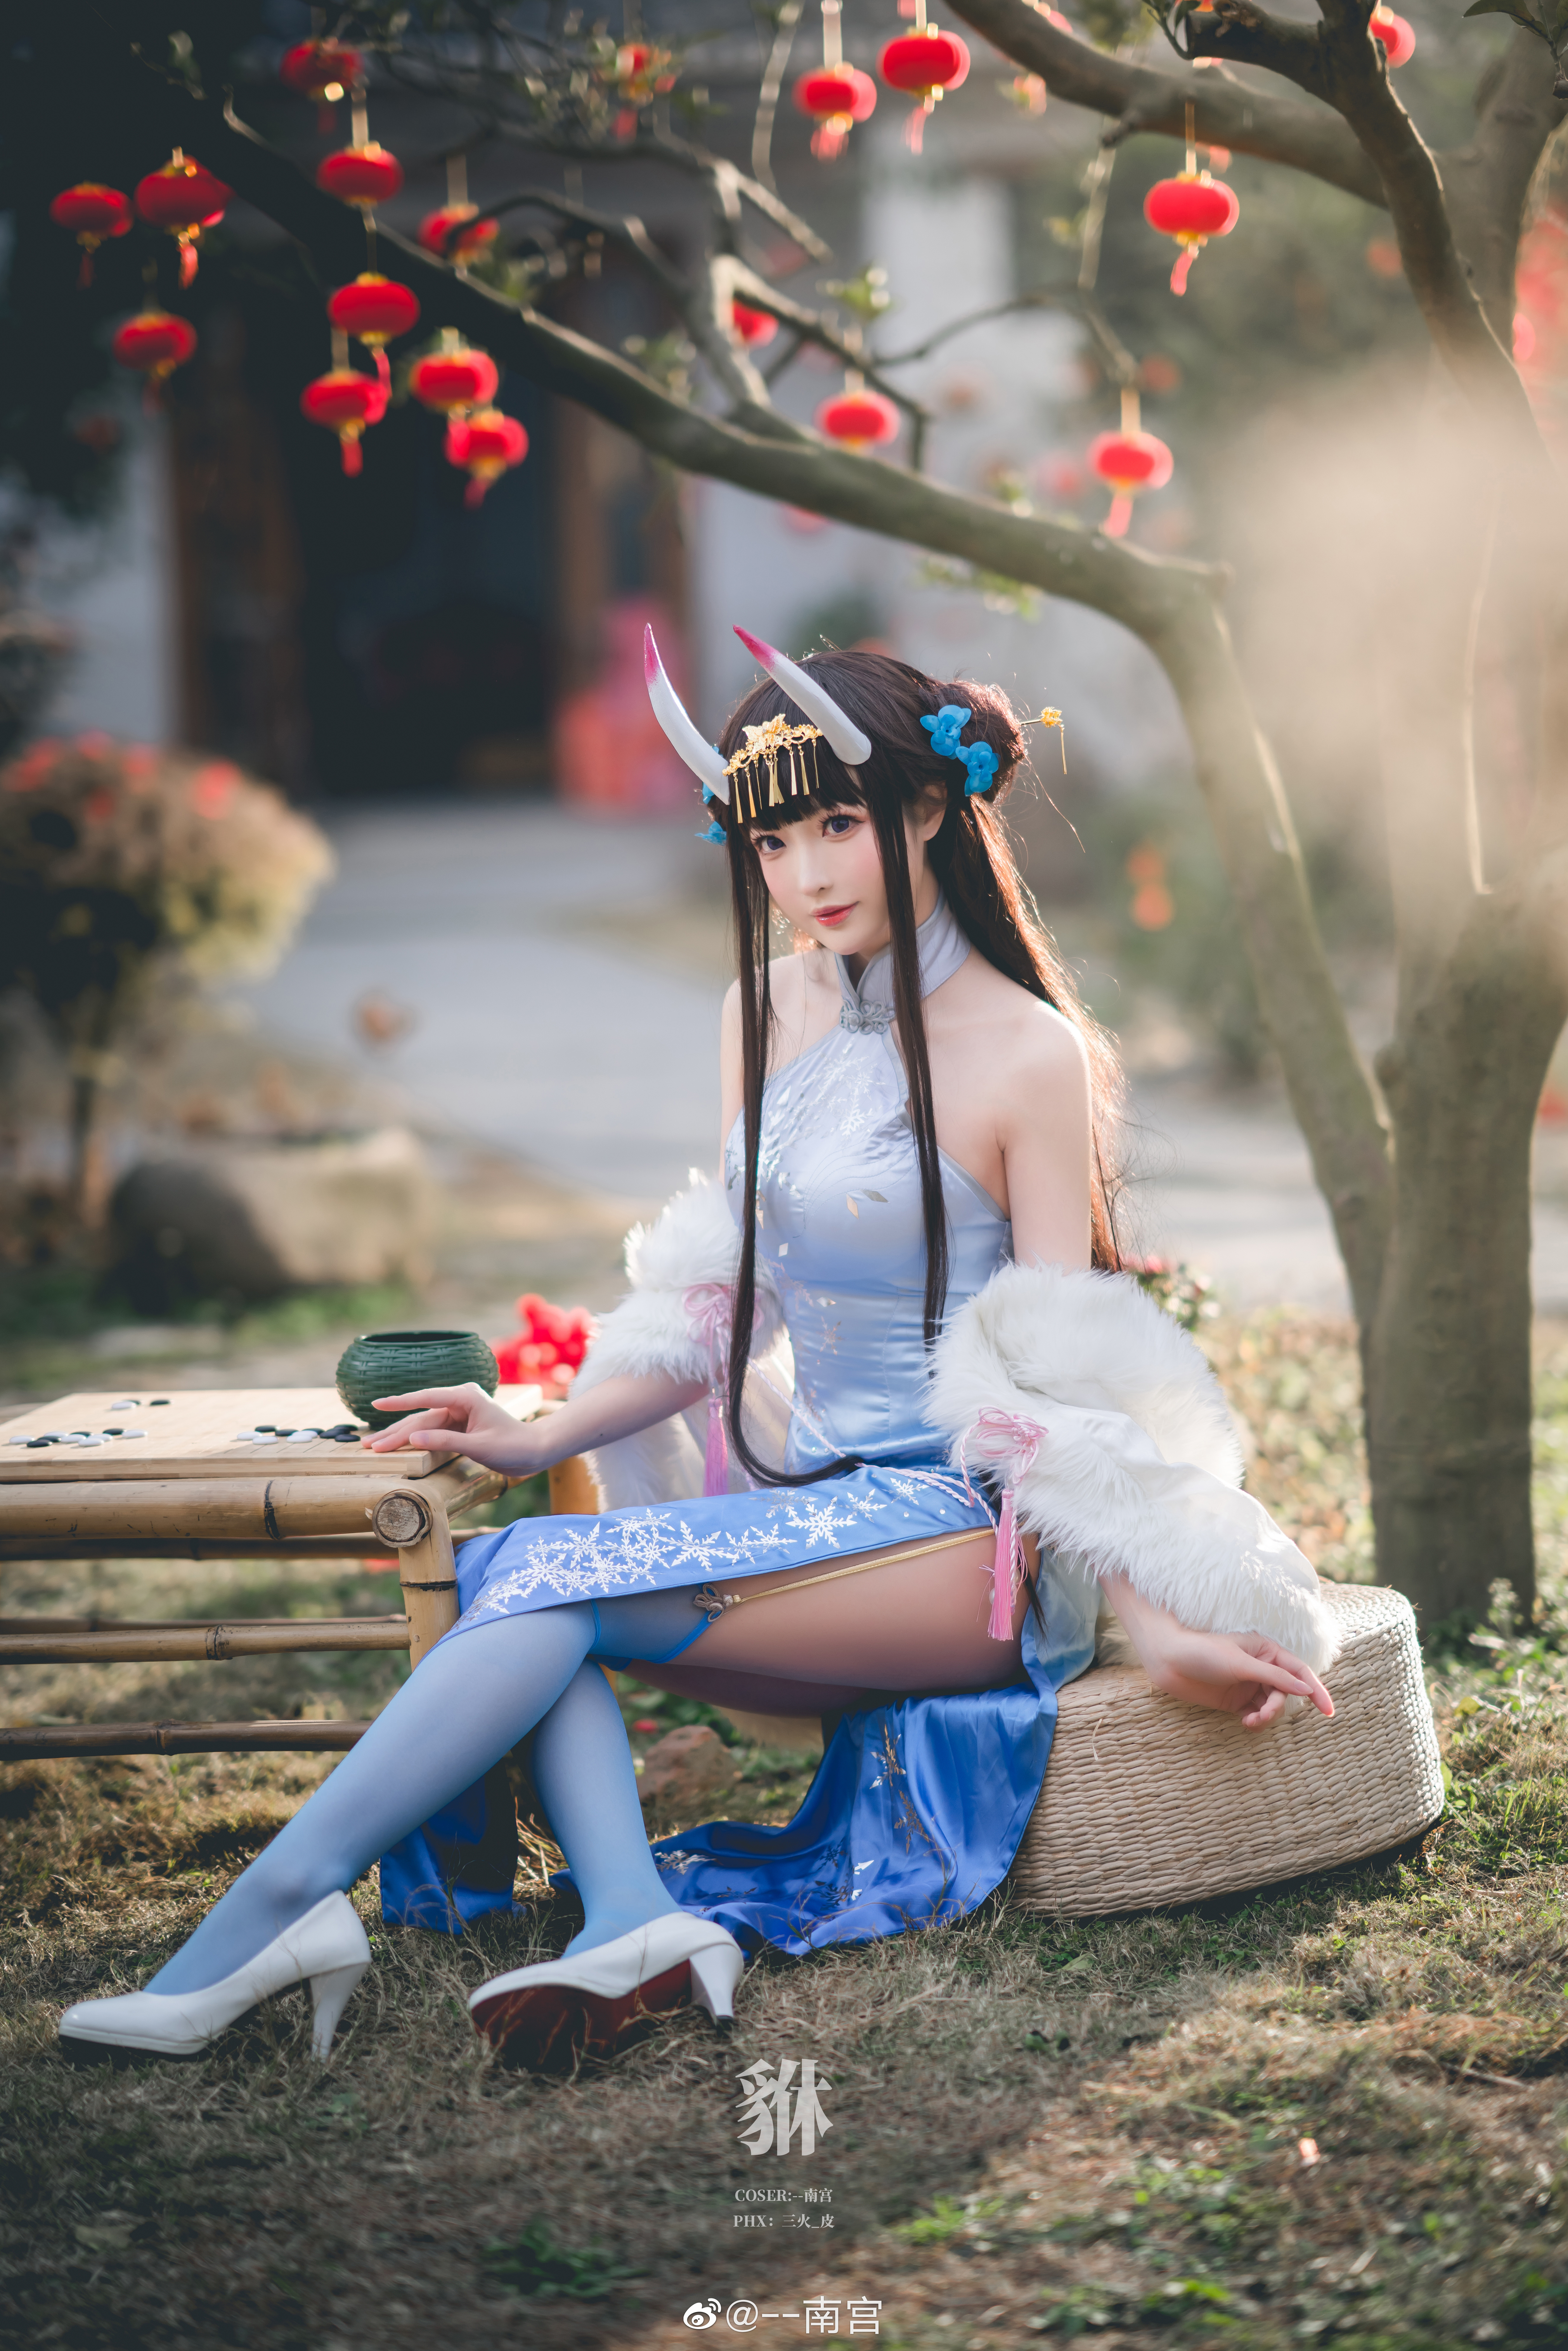 碧蓝航线 貅 cosplay Cosplay-第6张